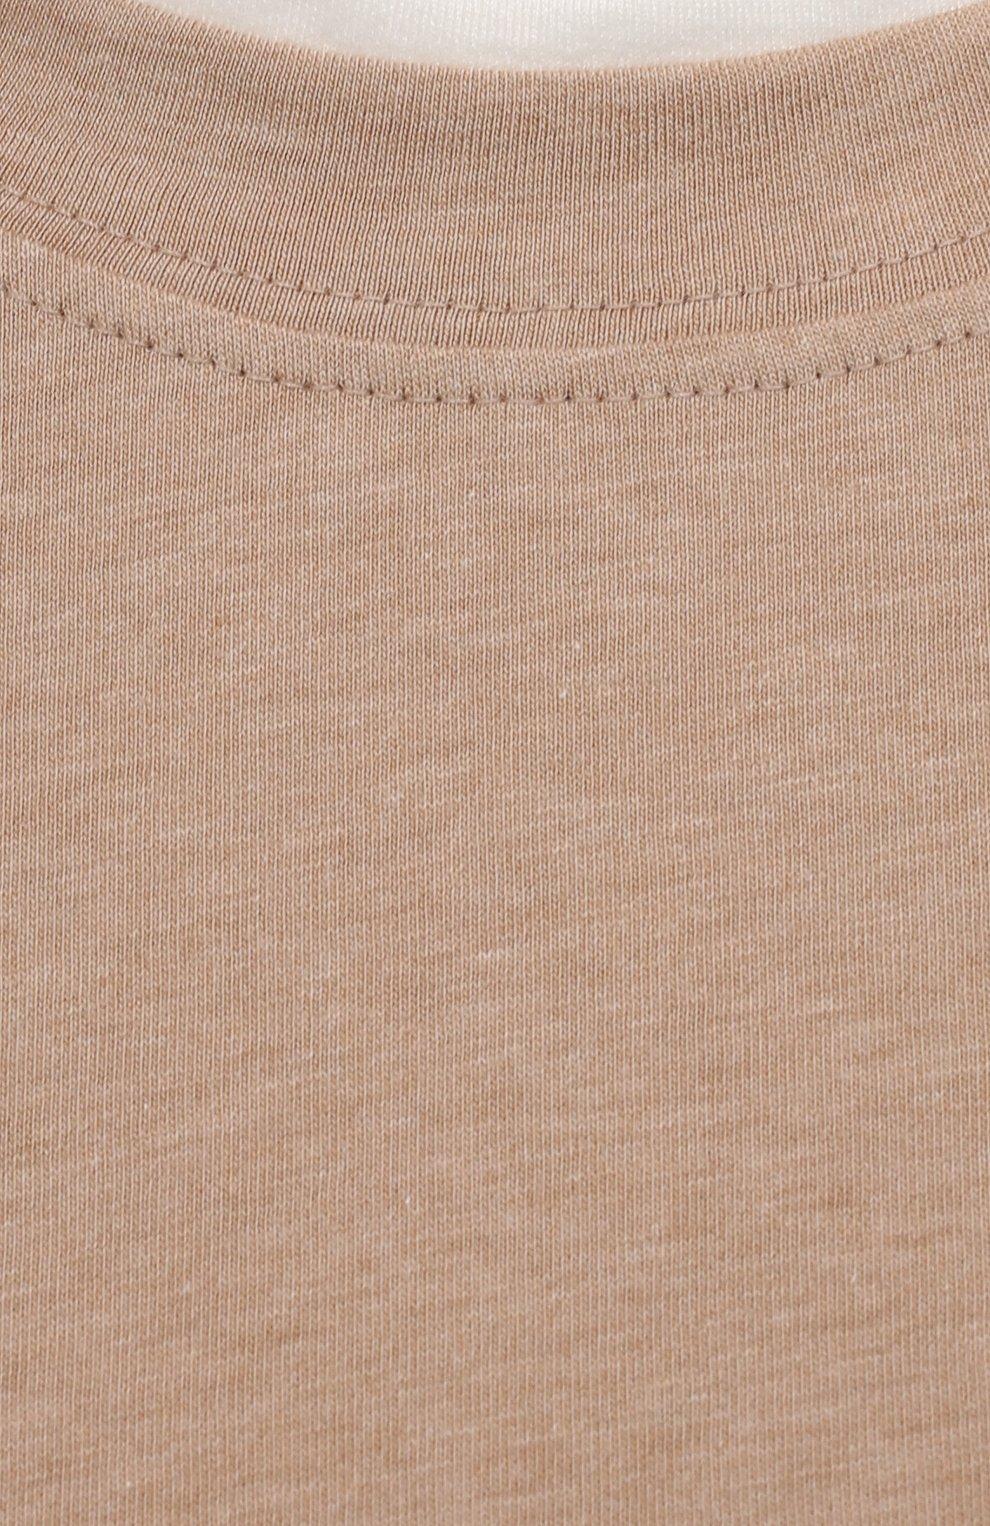 Мужская хлопковая футболка BRUNELLO CUCINELLI бежевого цвета, арт. M0T617427 | Фото 5